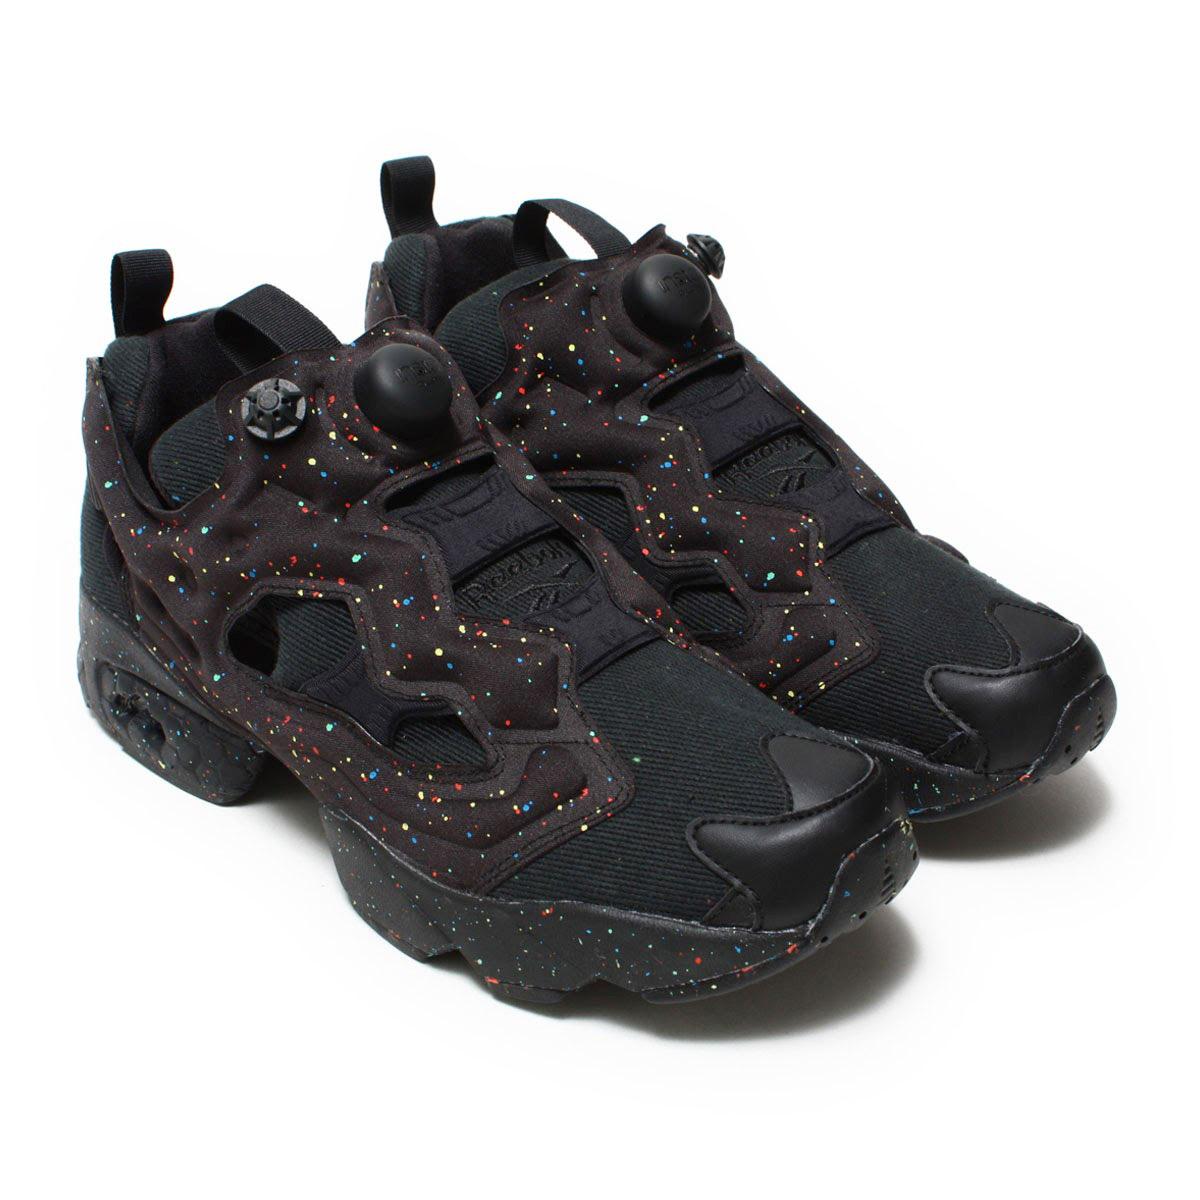 dedc504c0577 Reebok CLASSIC (Reebok classical music) sneakers. Undying masterpiece